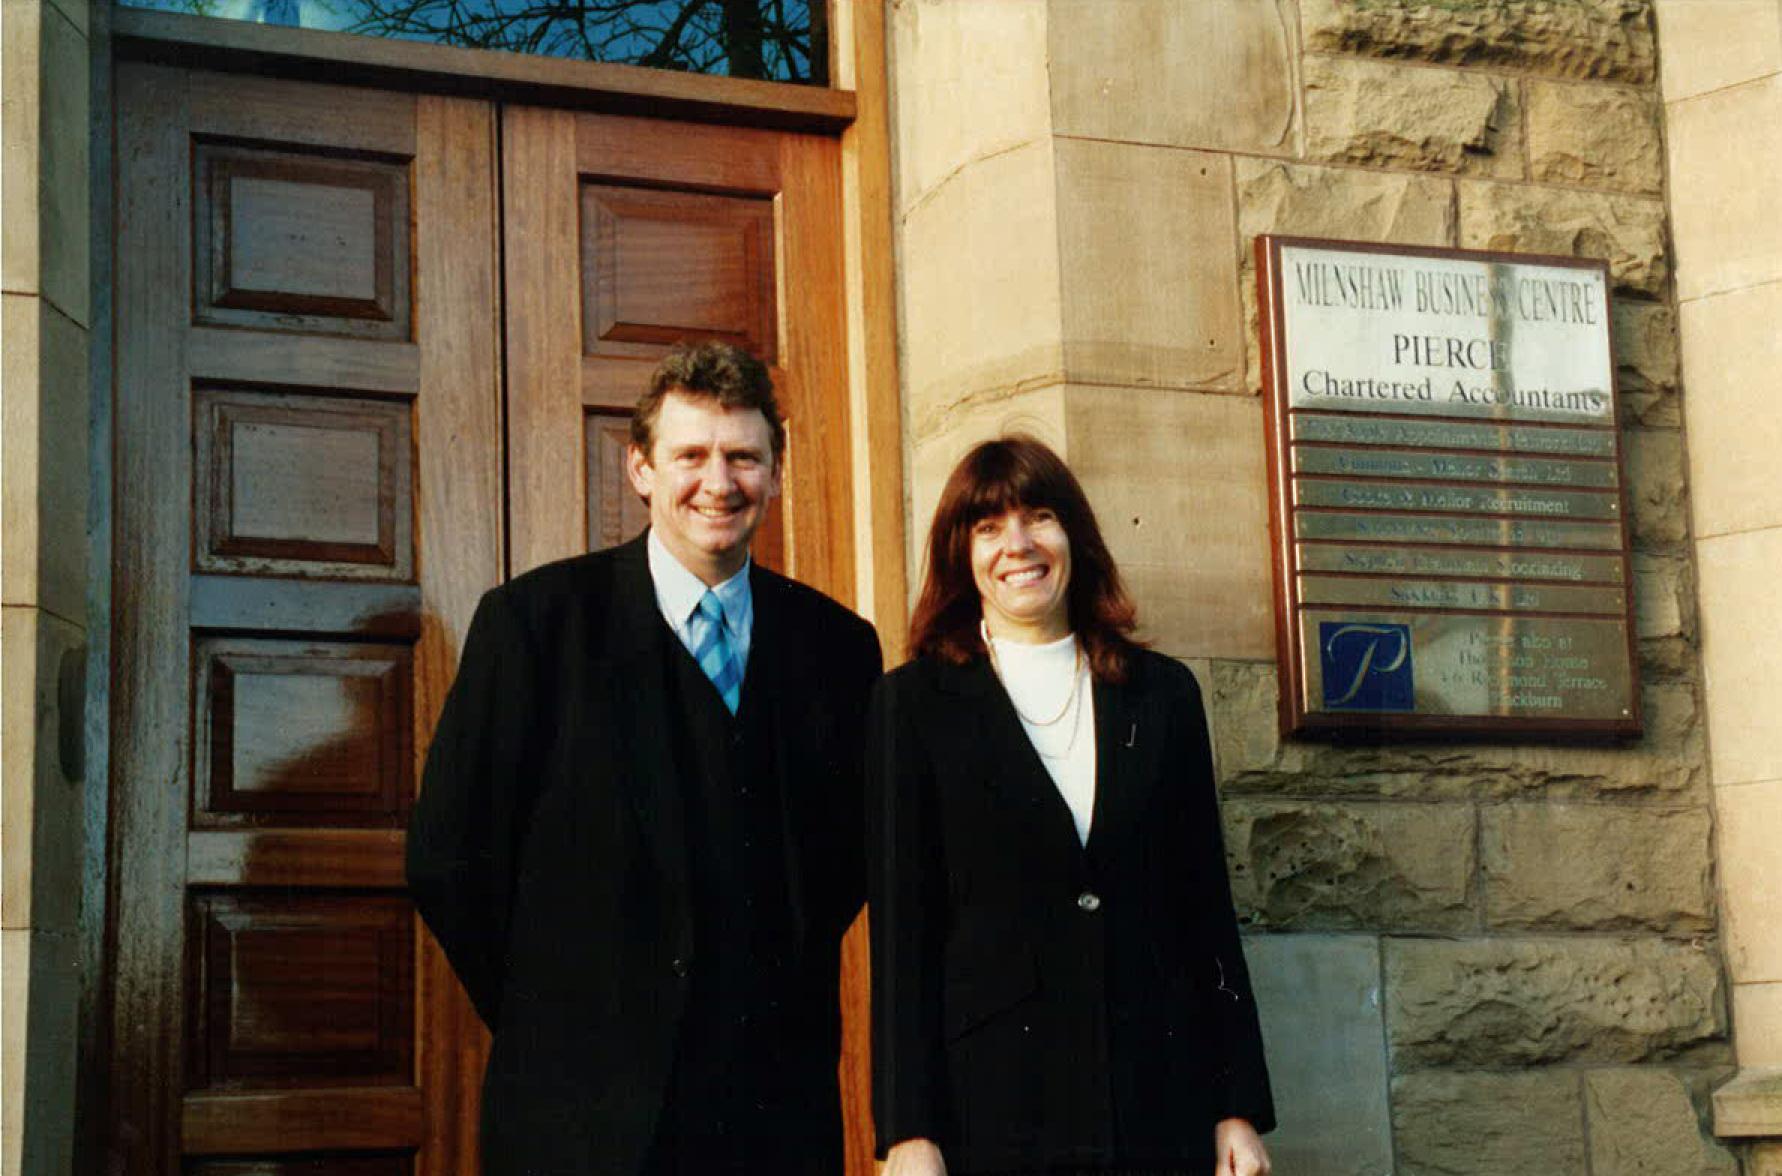 Richard Mellor and June Crossley